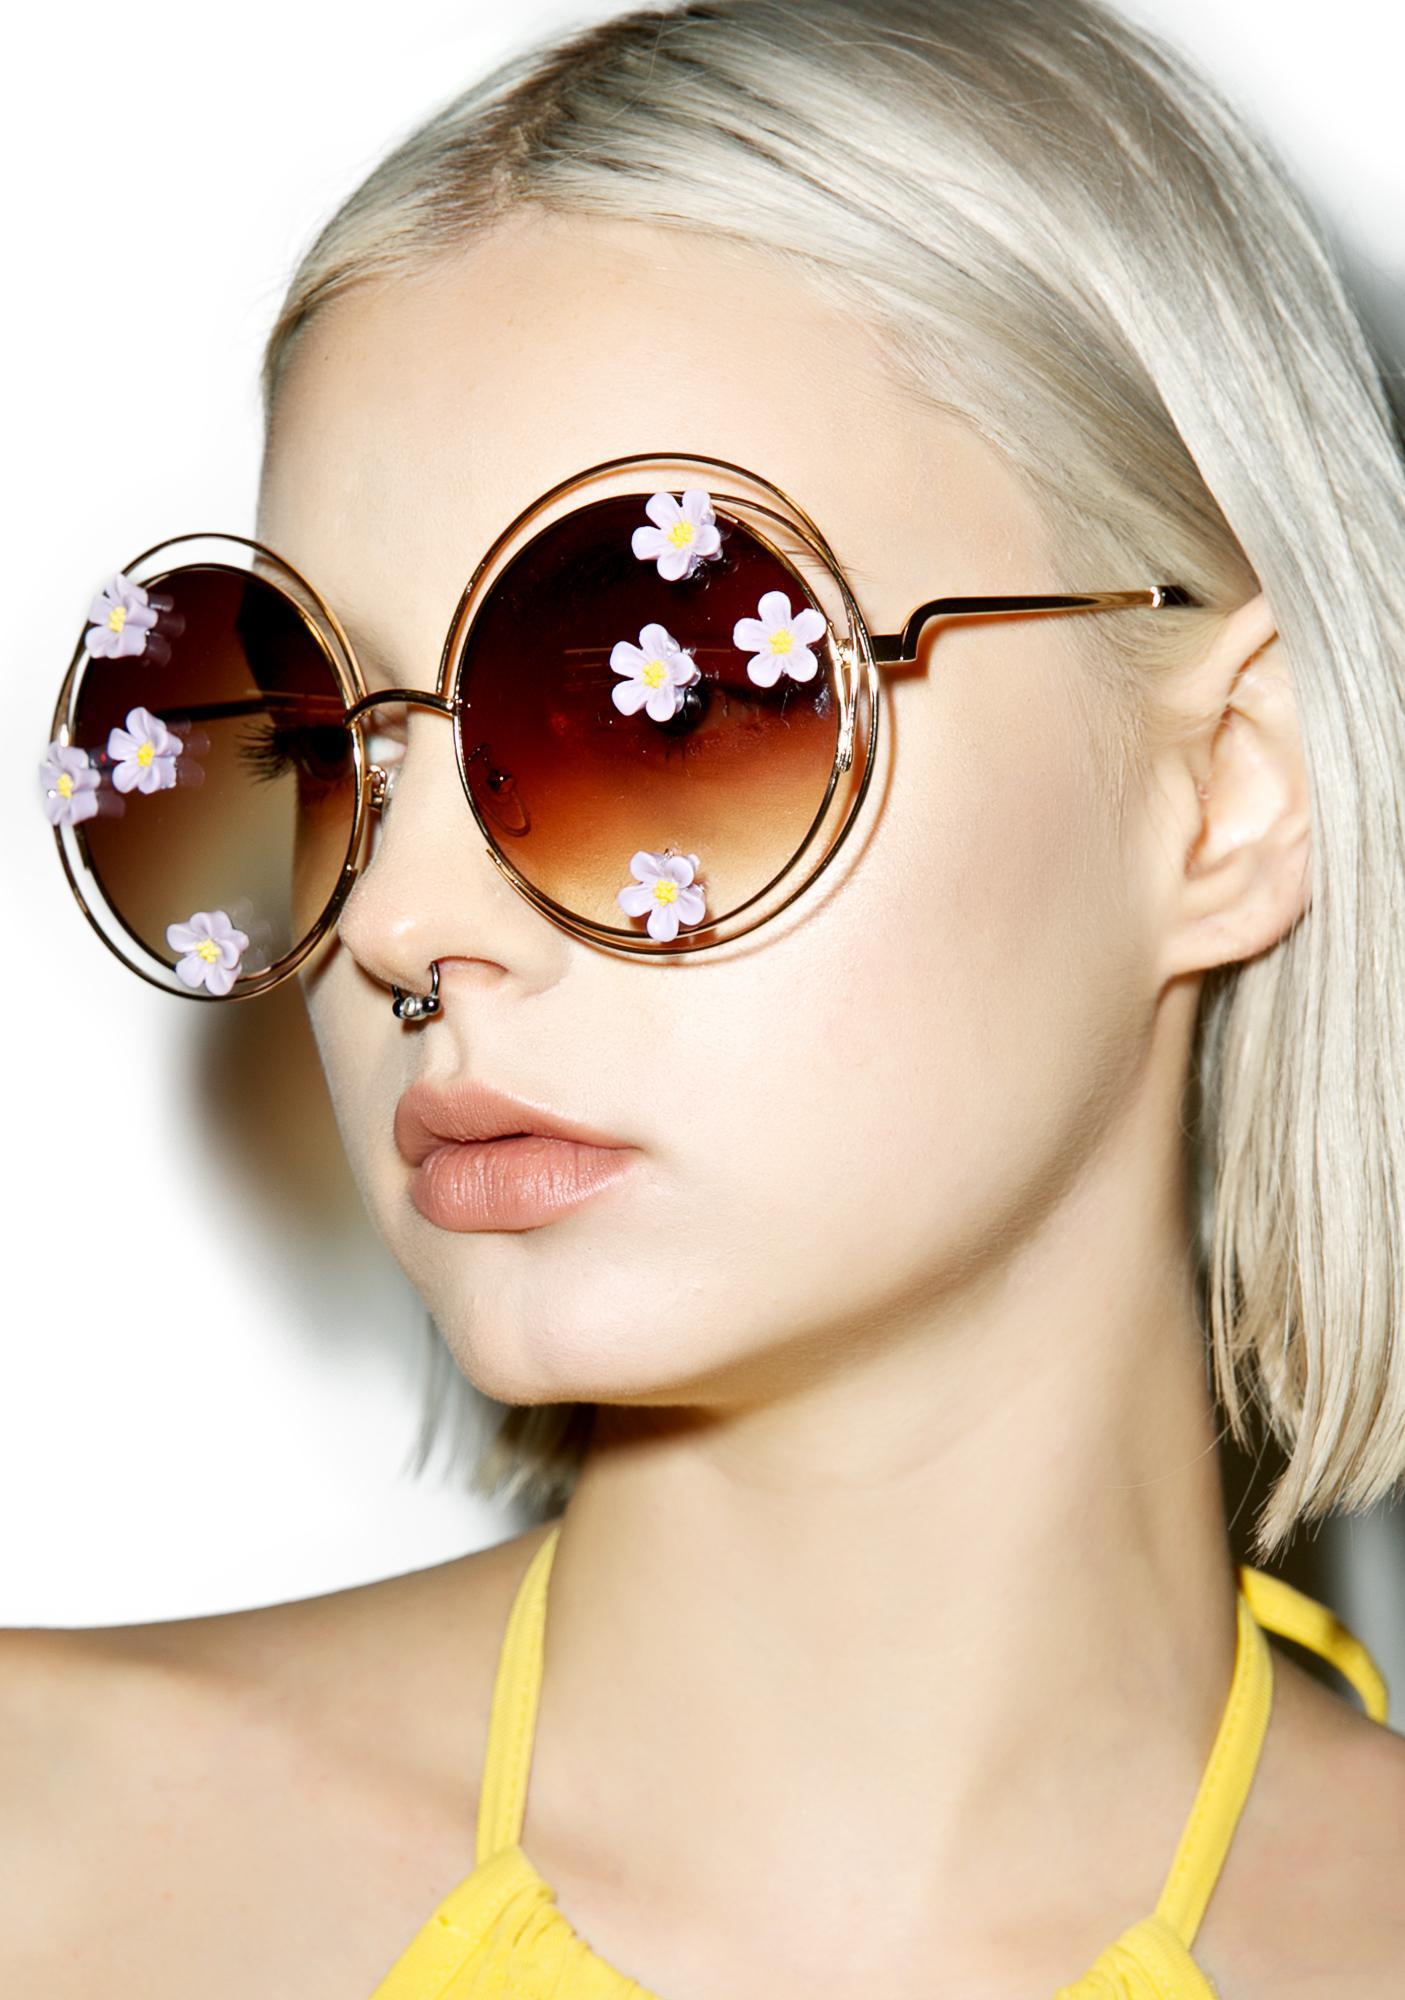 Gasoline Glamour Morning Glory Sunglasses